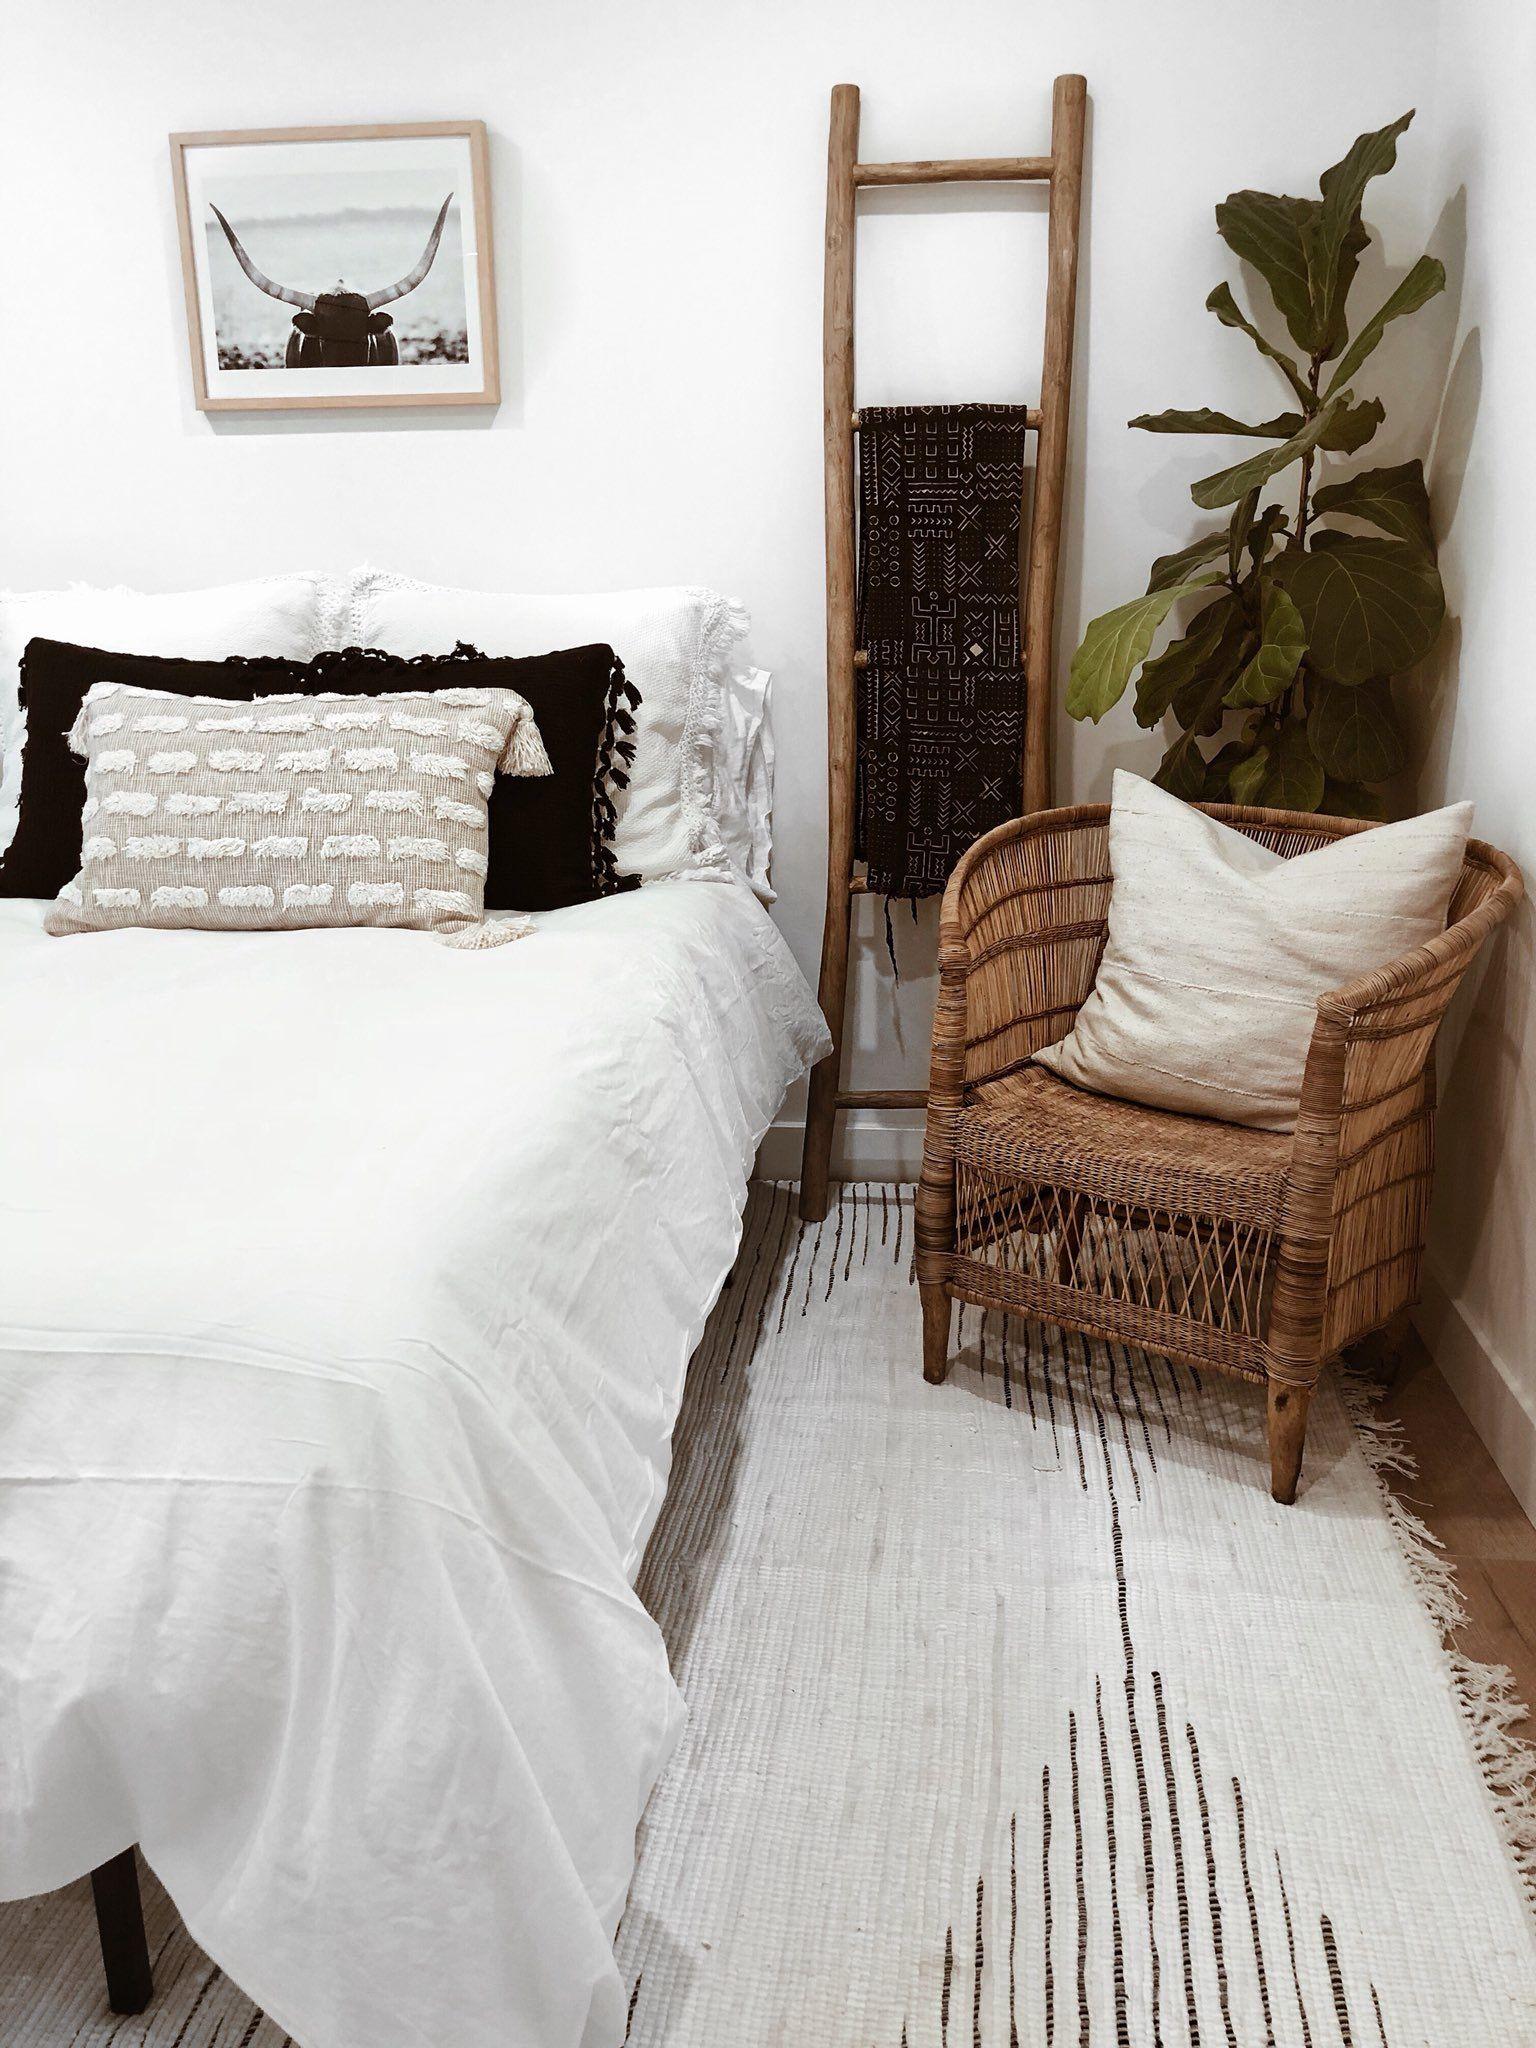 Pin by Taryn on Sivan Guest bedroom decor, Bedroom